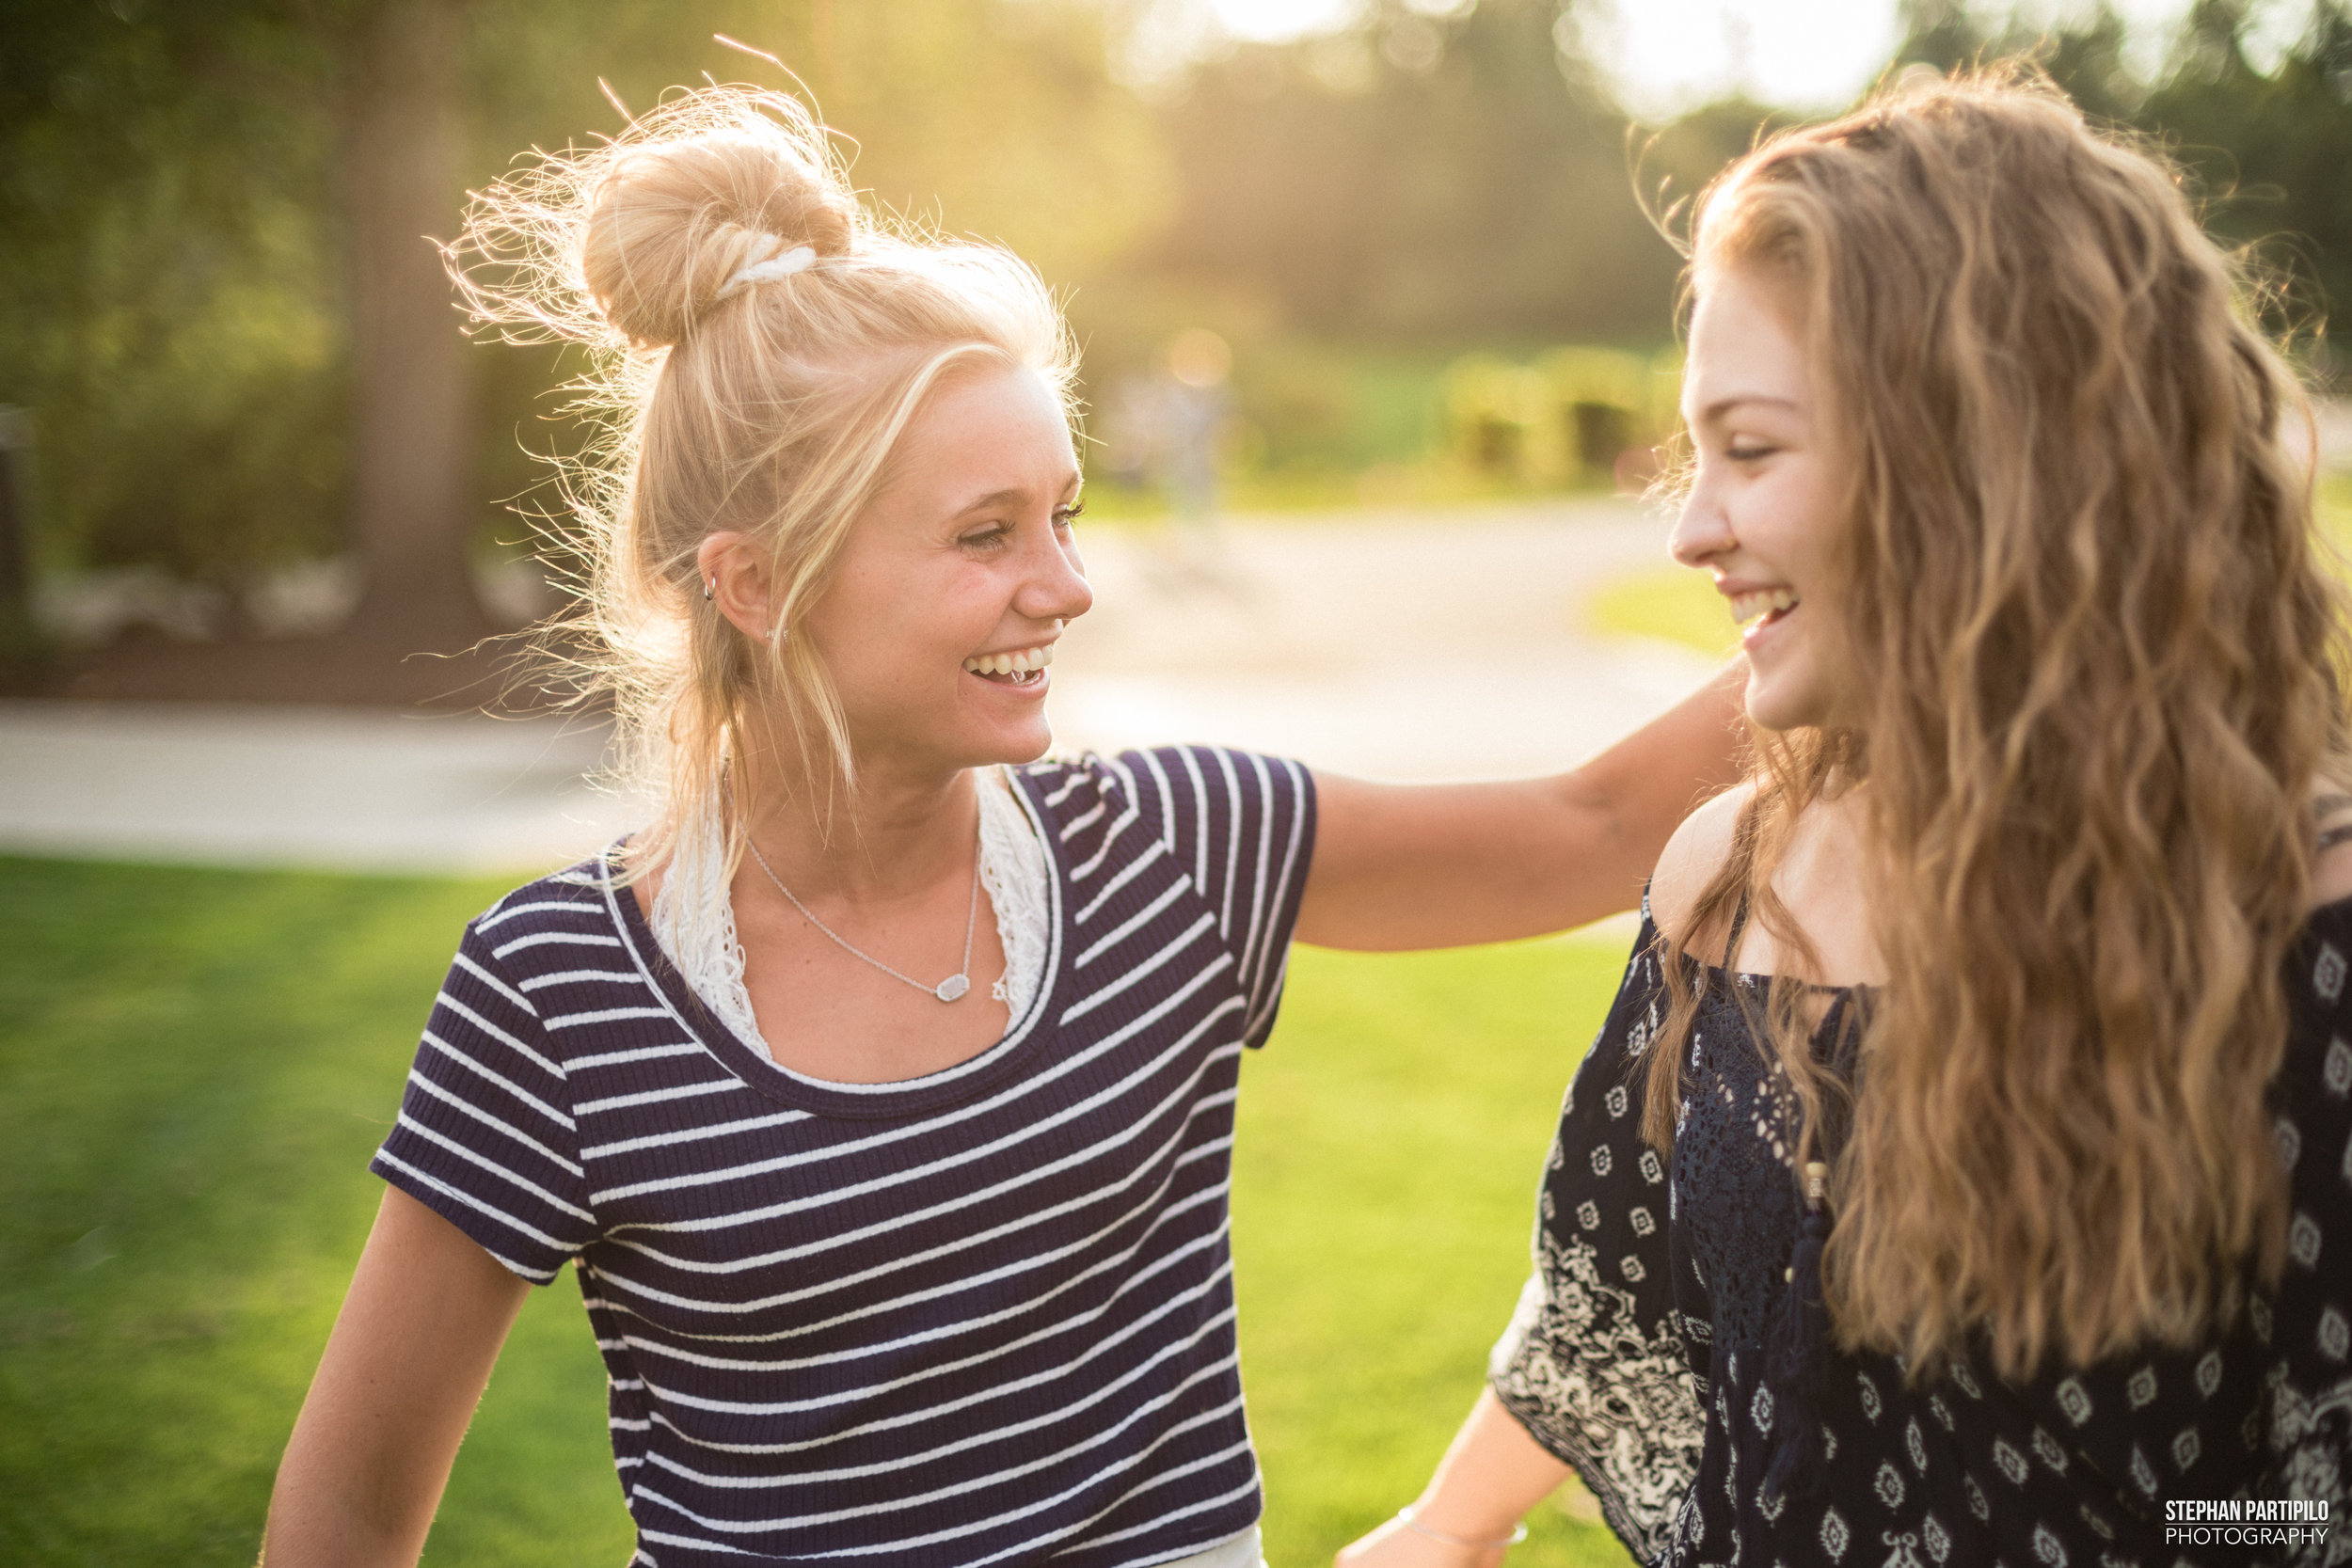 August 10 2018 Hannah & Claire 0G5A3057.jpg